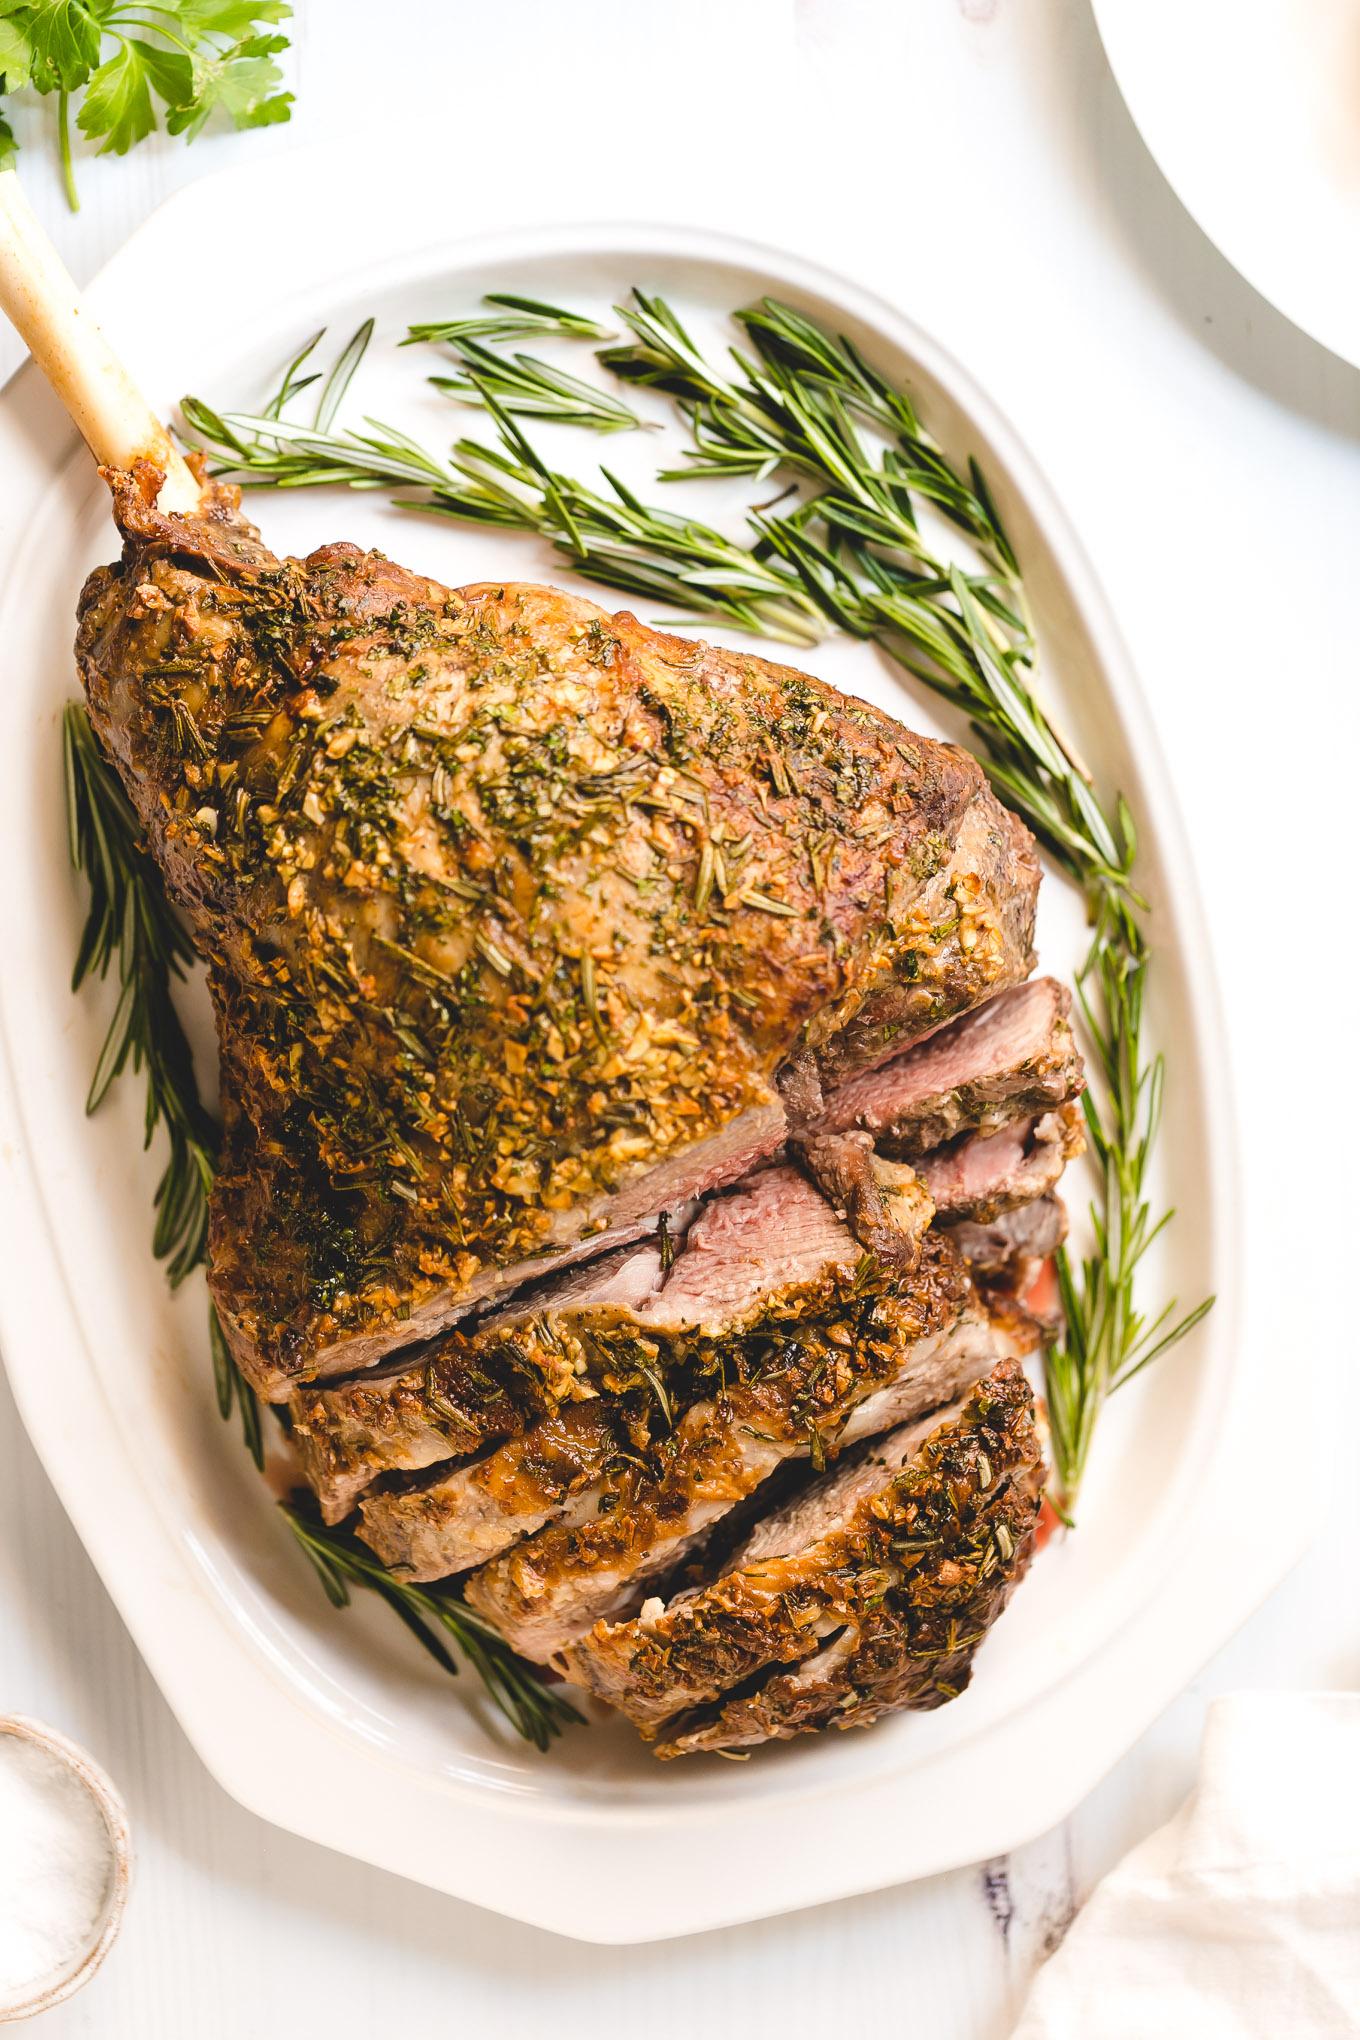 Garlic Herb Roasted Lamb Leg from Superior Farms American lamb